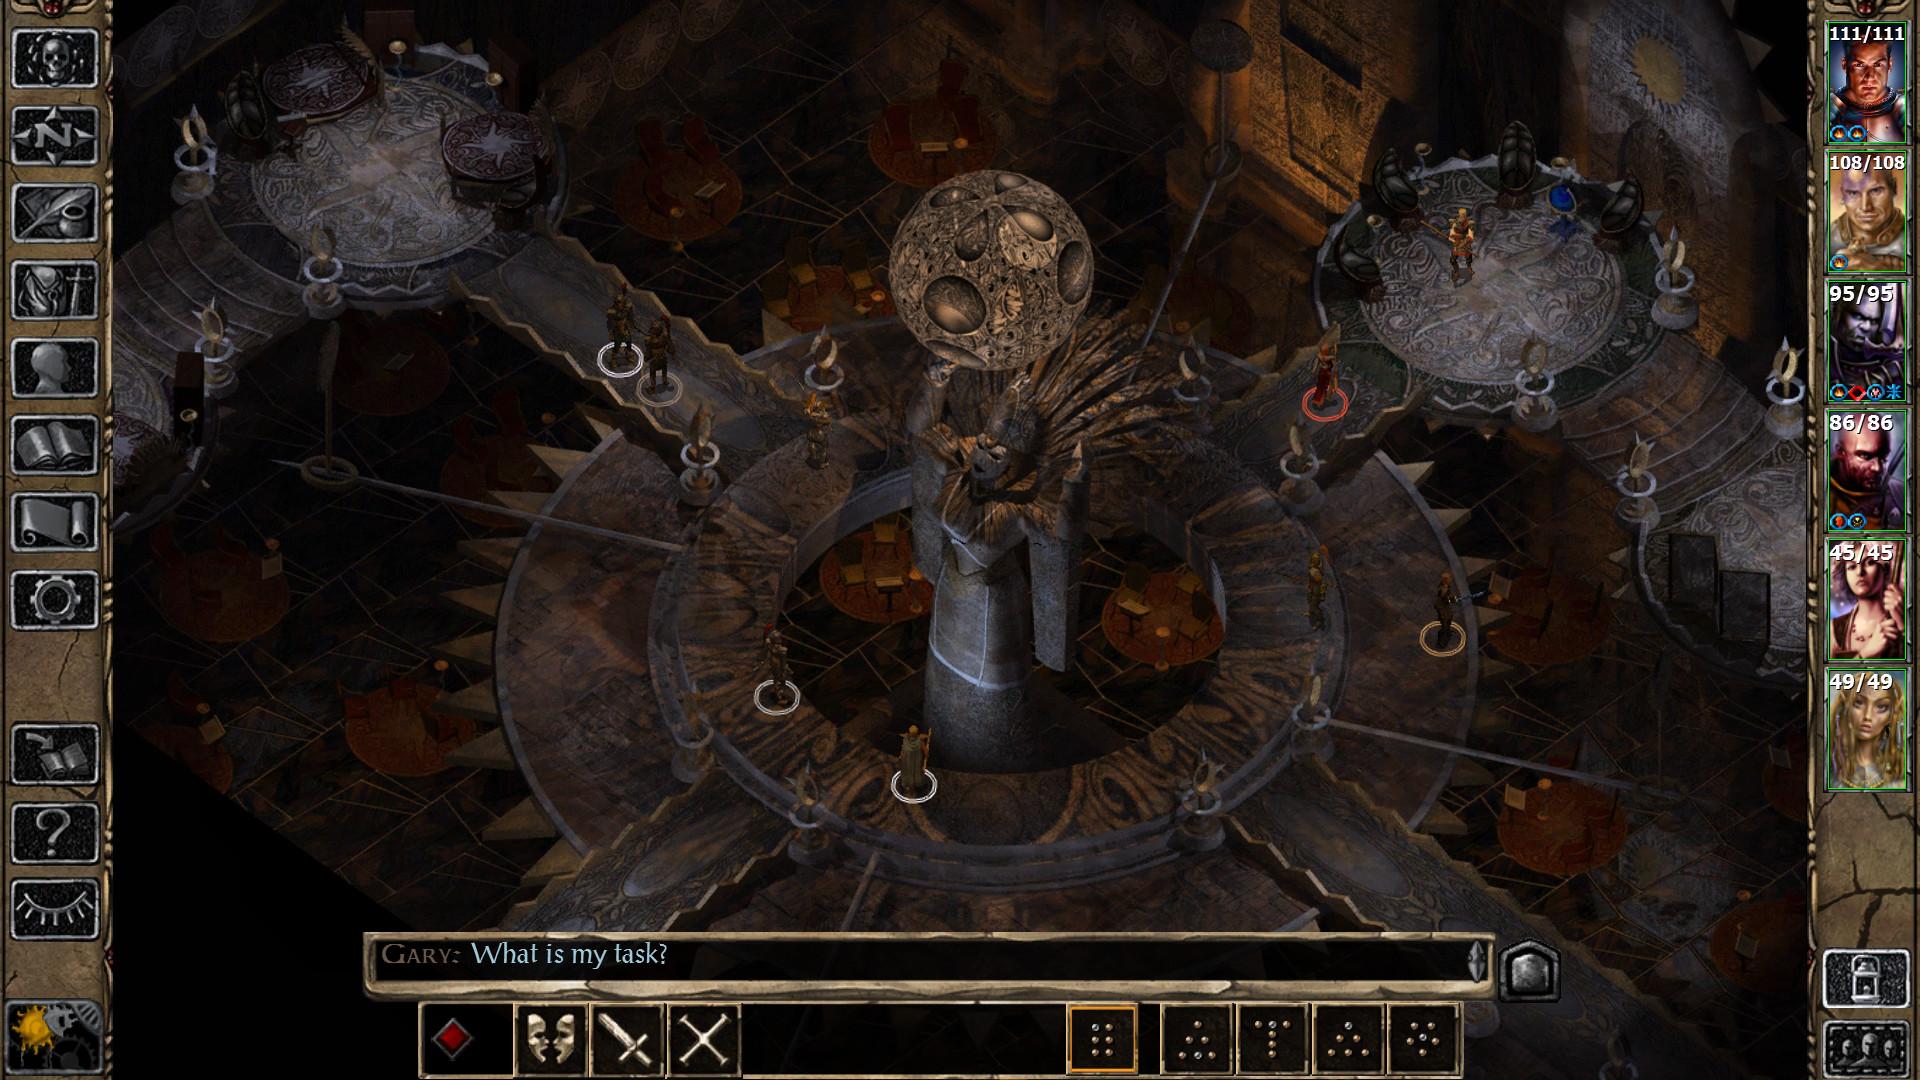 baldurs-gate-2-enhanced-edition-pc-screenshot-3